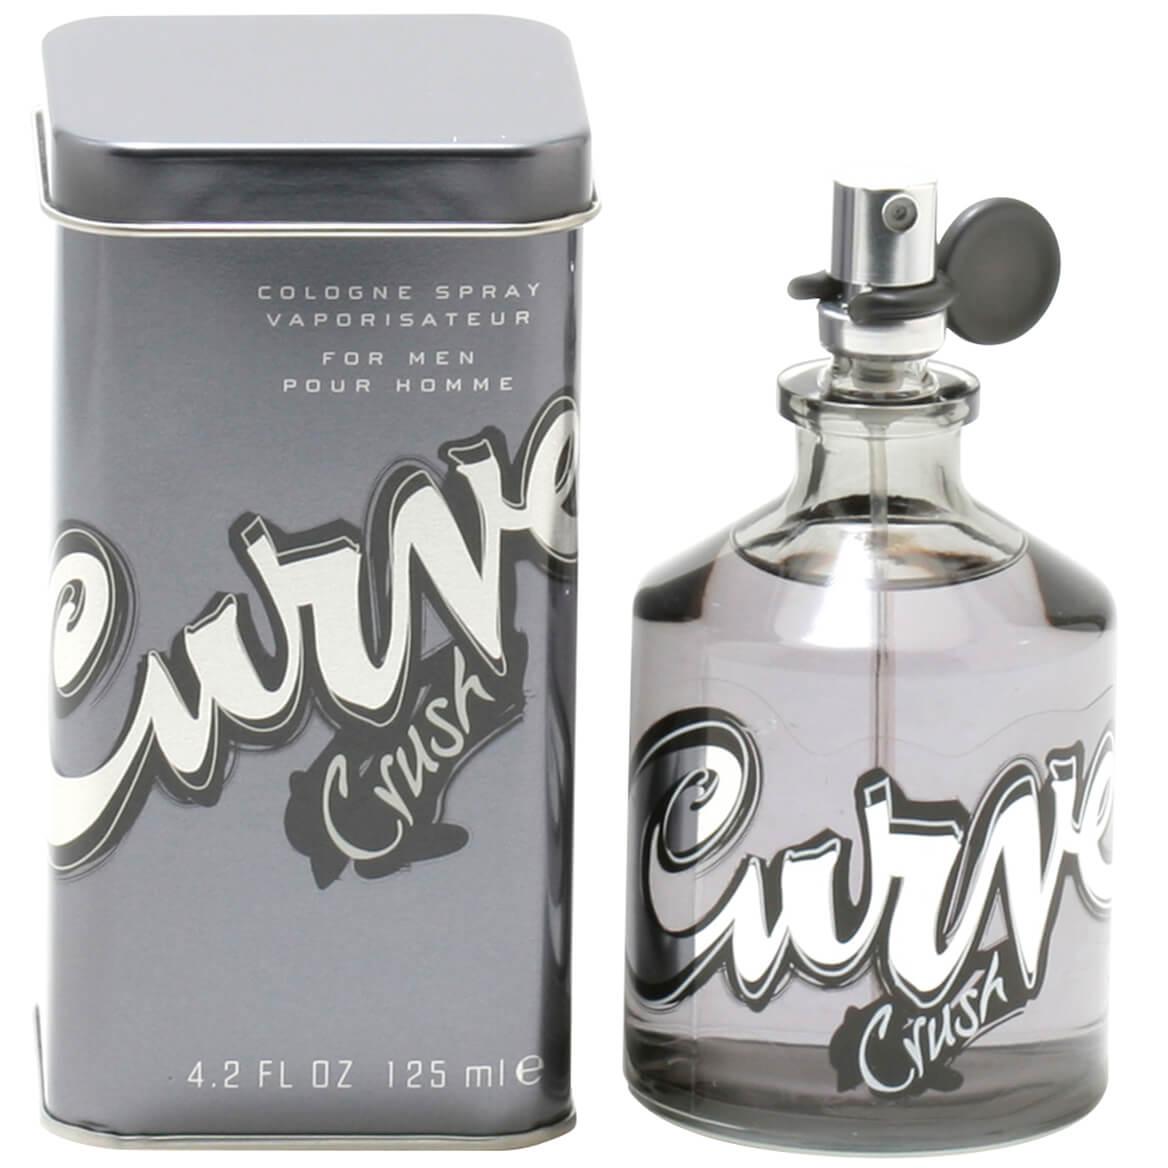 Liz Claiborne Curve Crush Men, Cologne Spray 4.2oz-360295